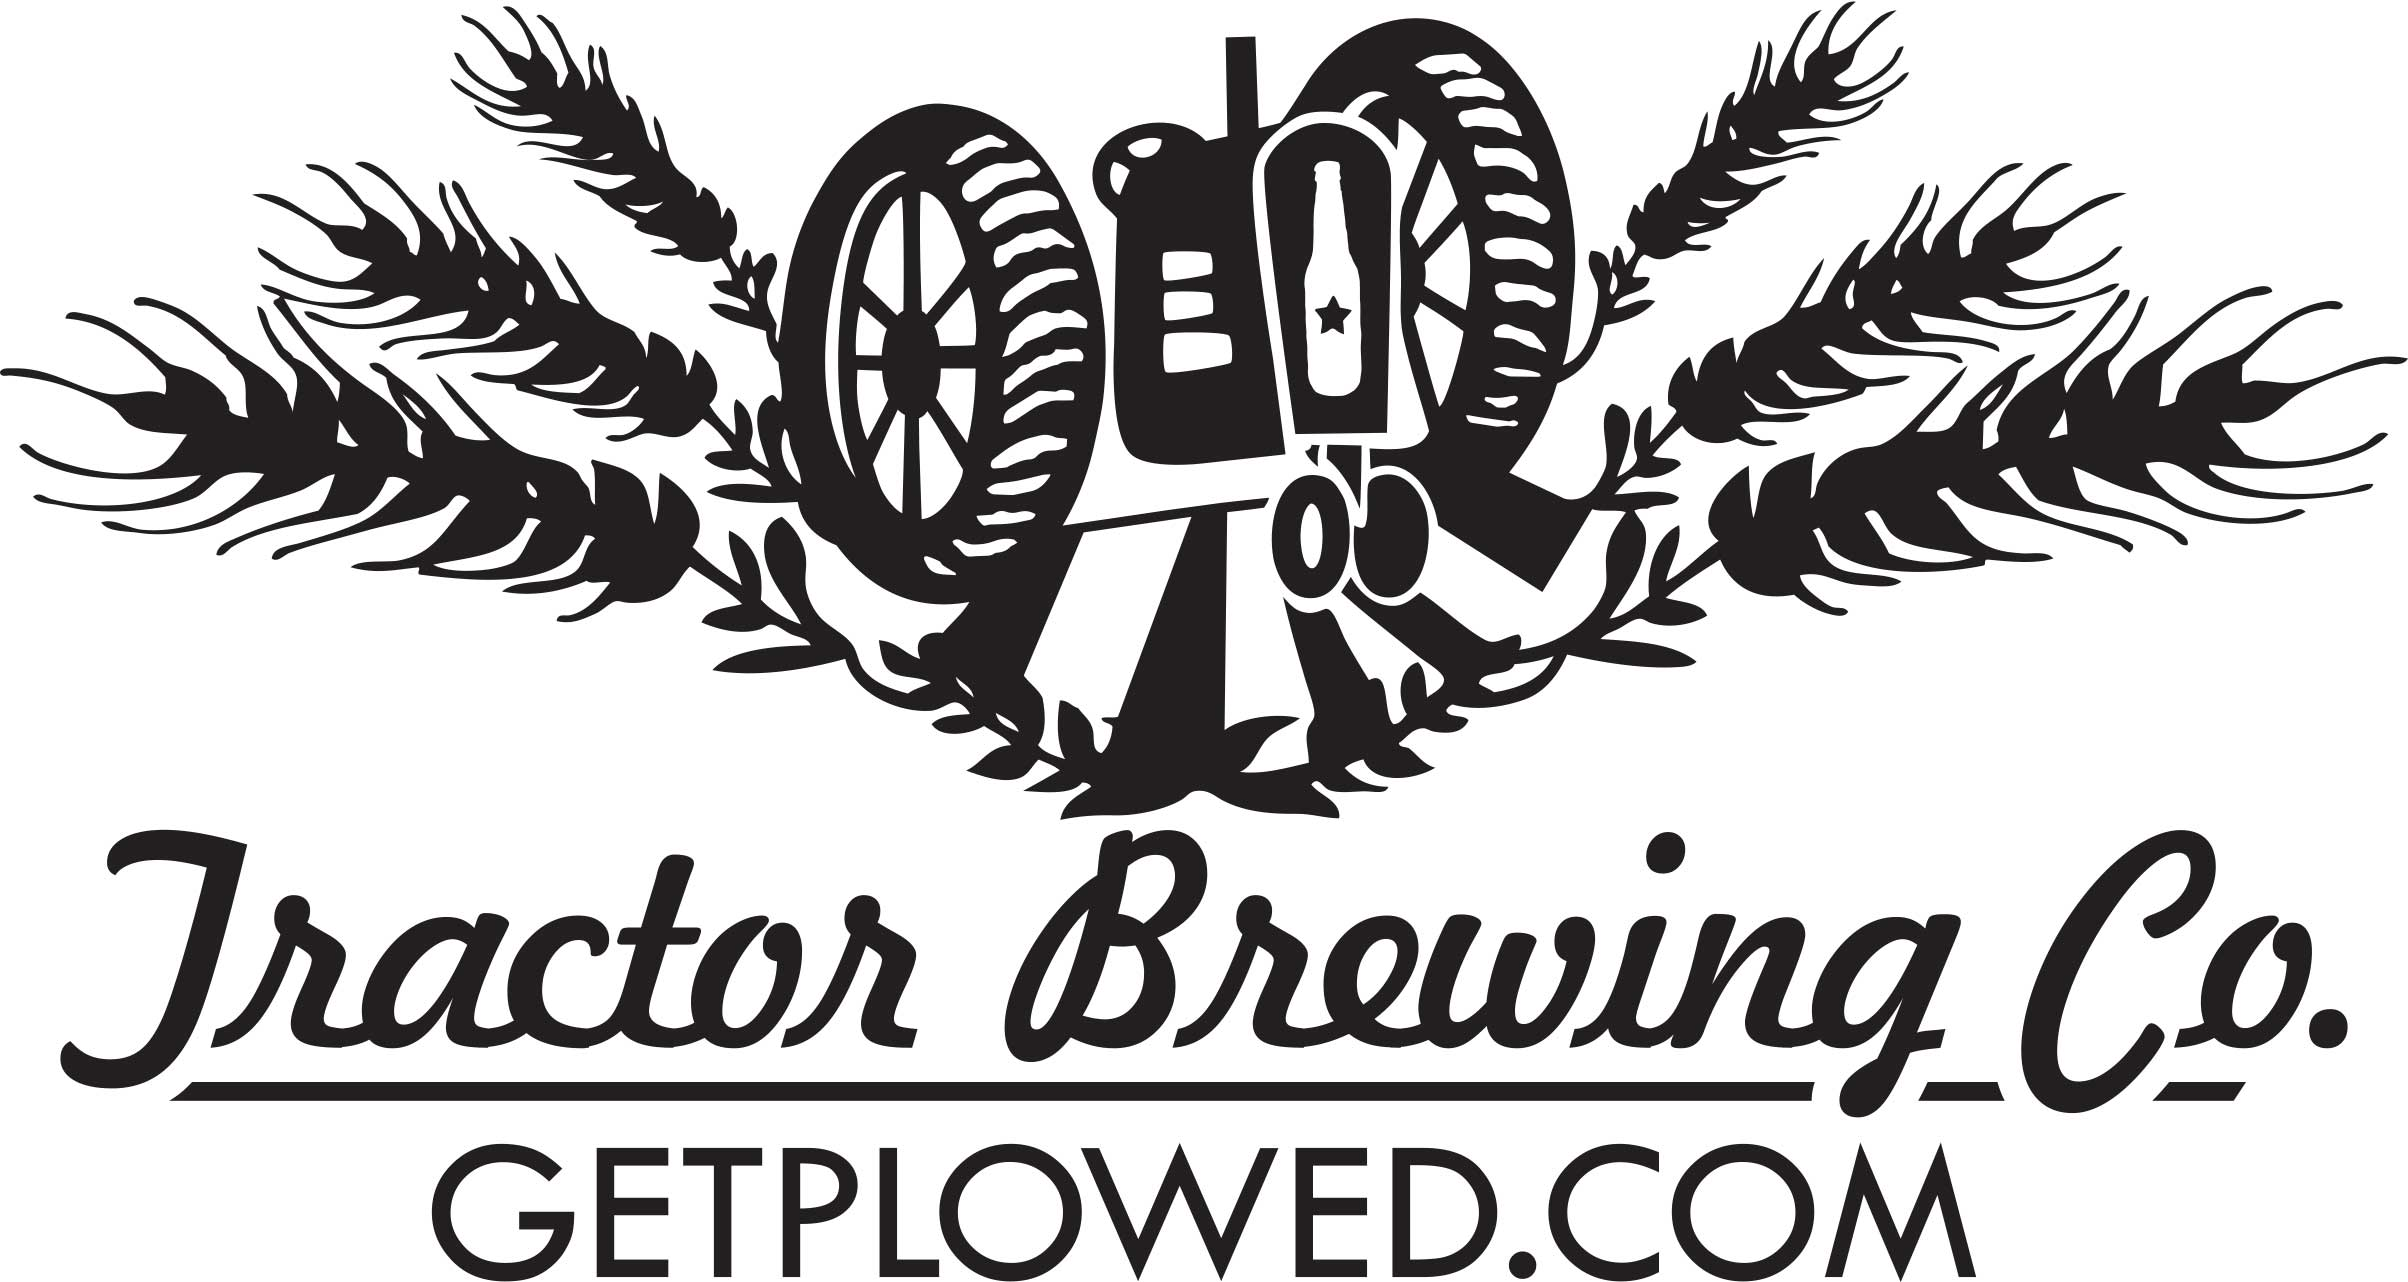 Tractor-Brewing-Company-Logo-1.jpg